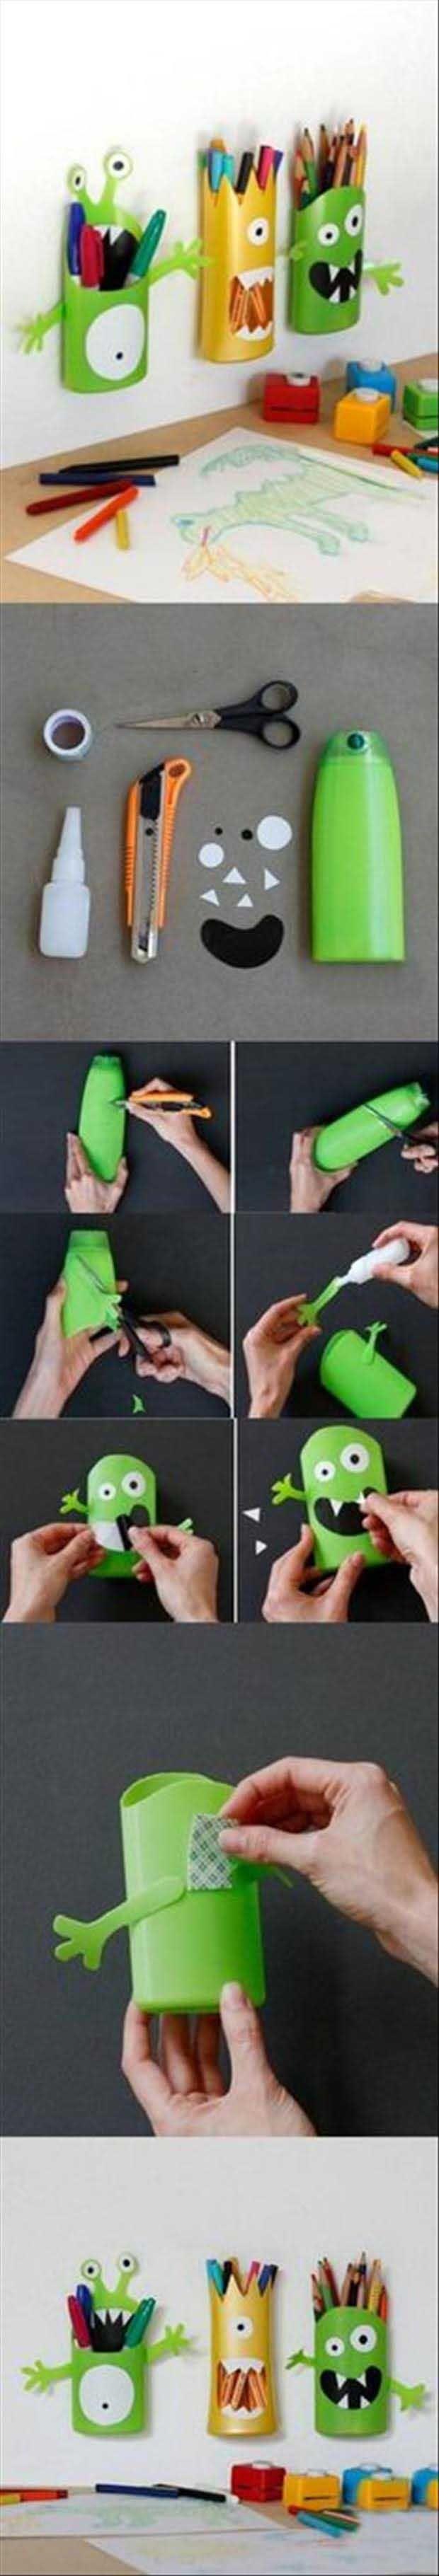 Fun Do It Yourself Craft Ideas - 30 Pics